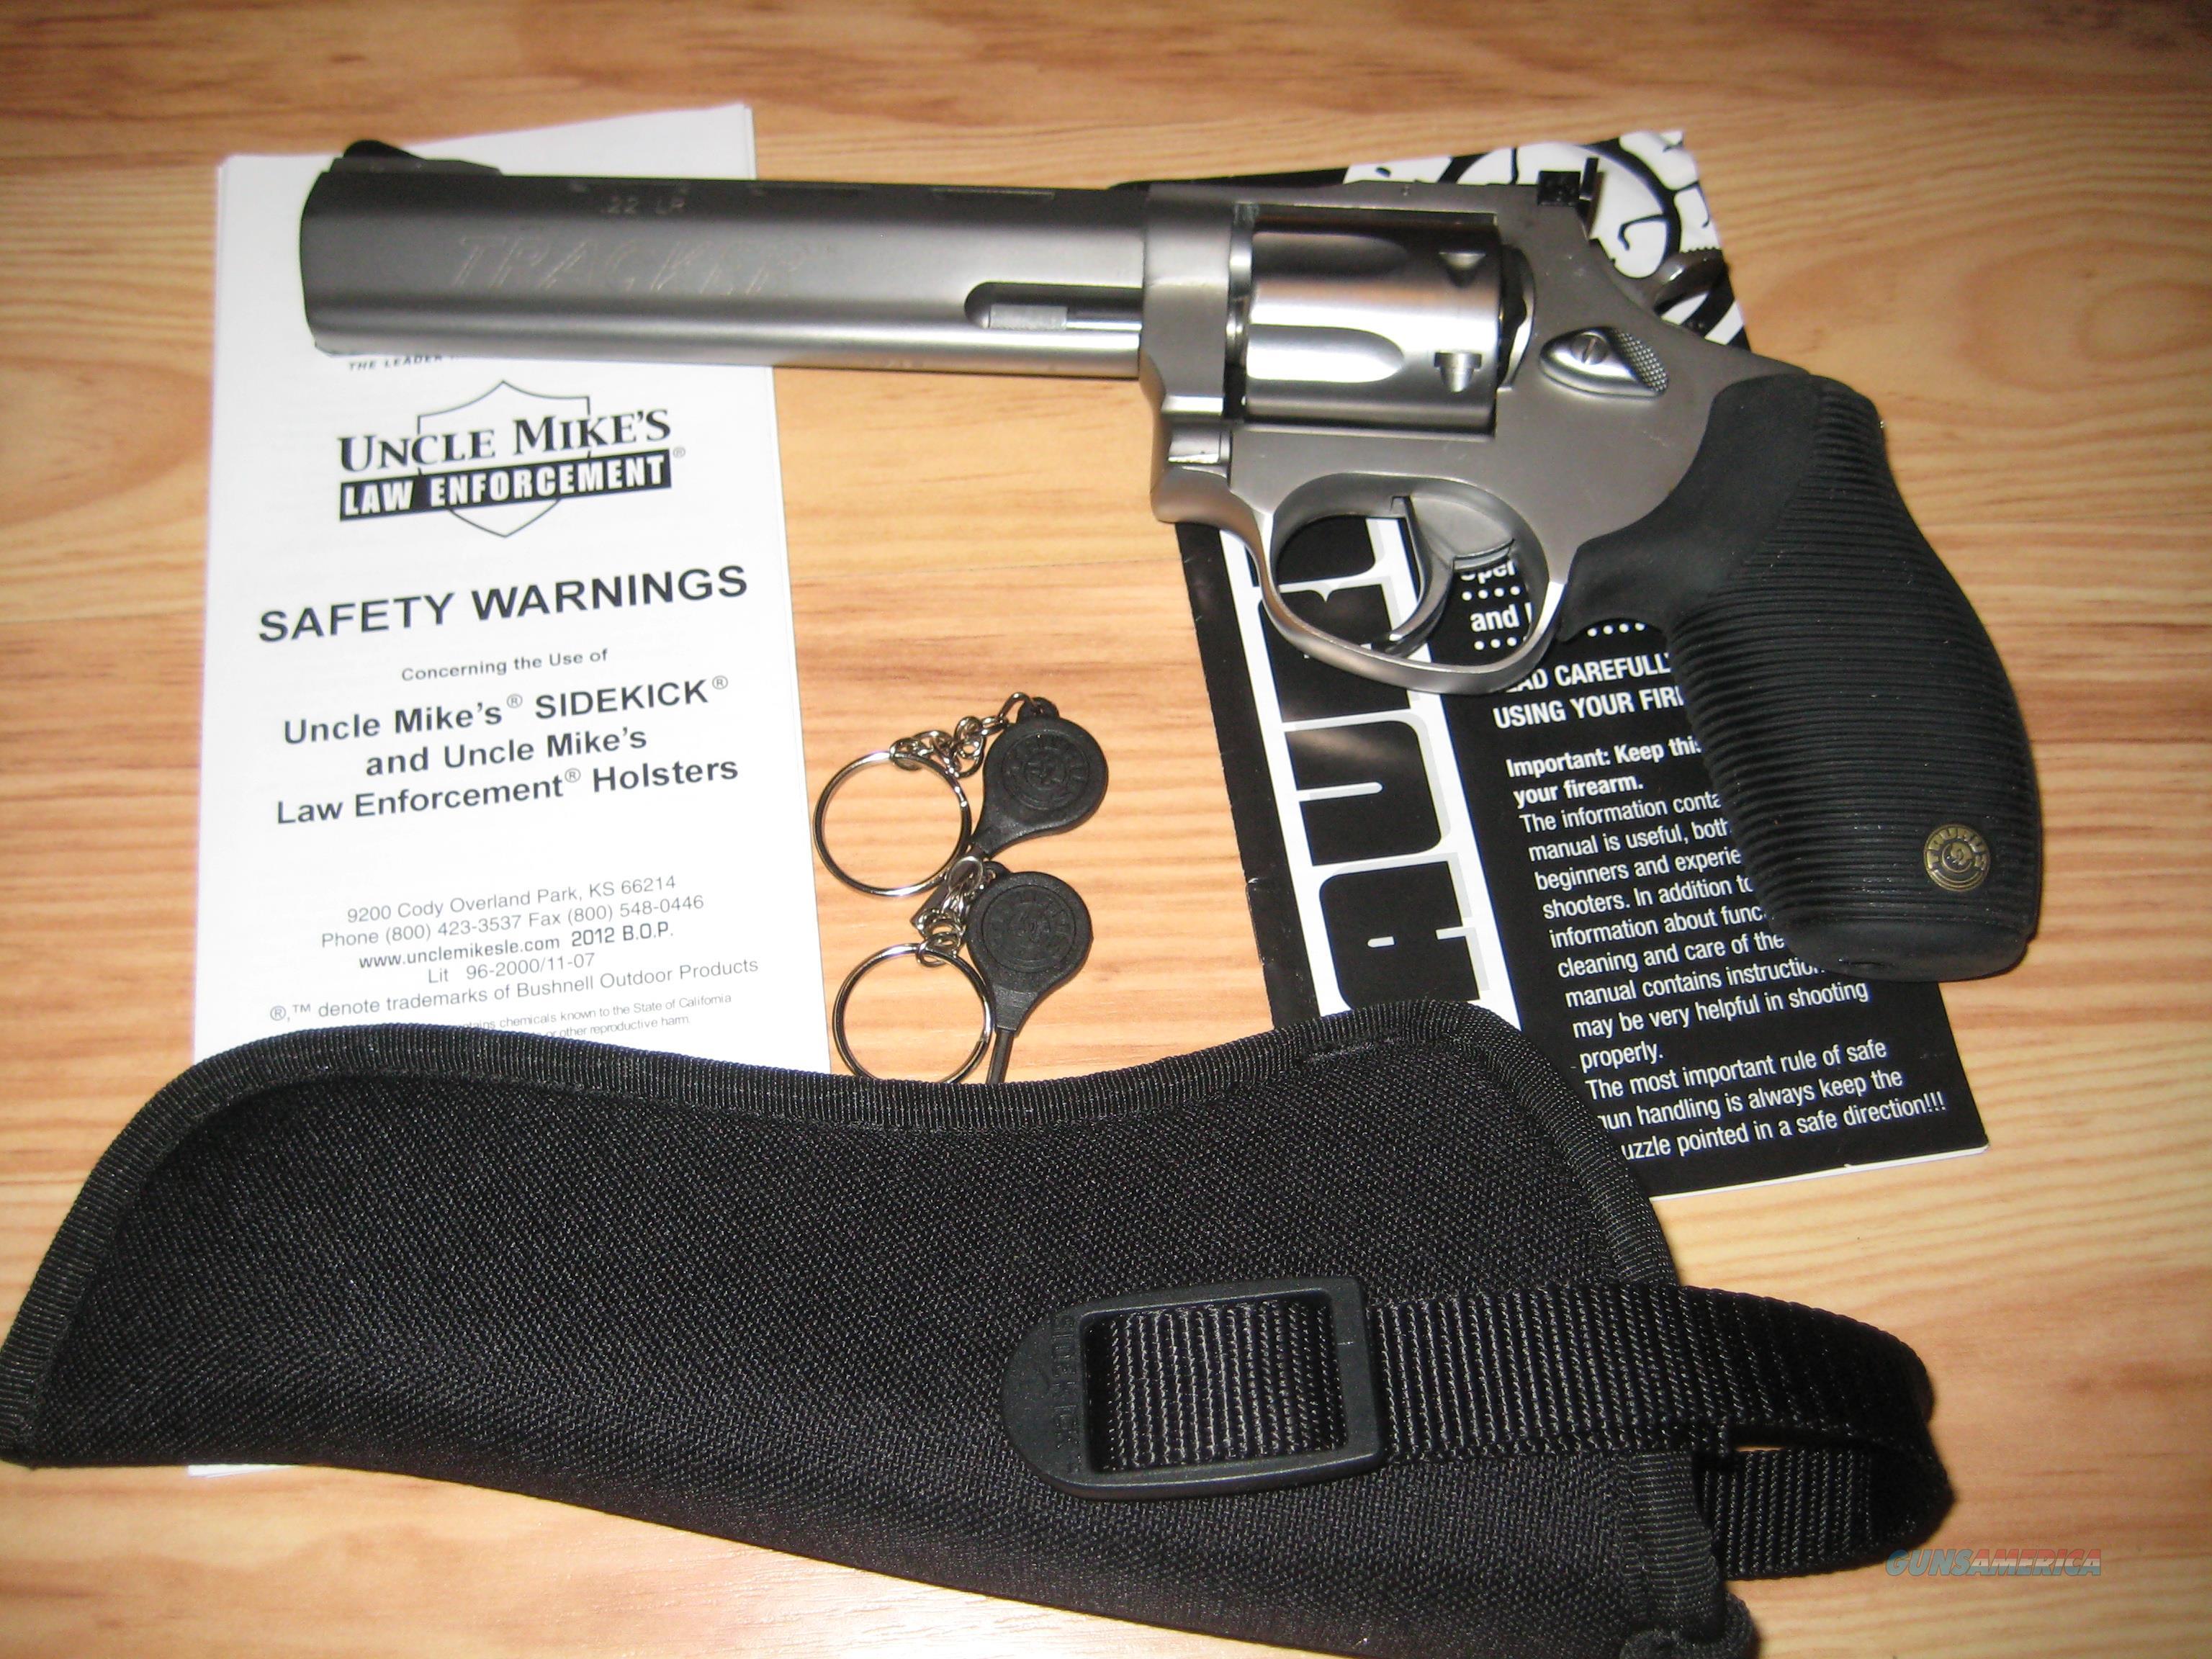 Taurus Tracker .22 LR (7 shot cylinder) Model 970SS6  Guns > Pistols > Taurus Pistols > Revolvers